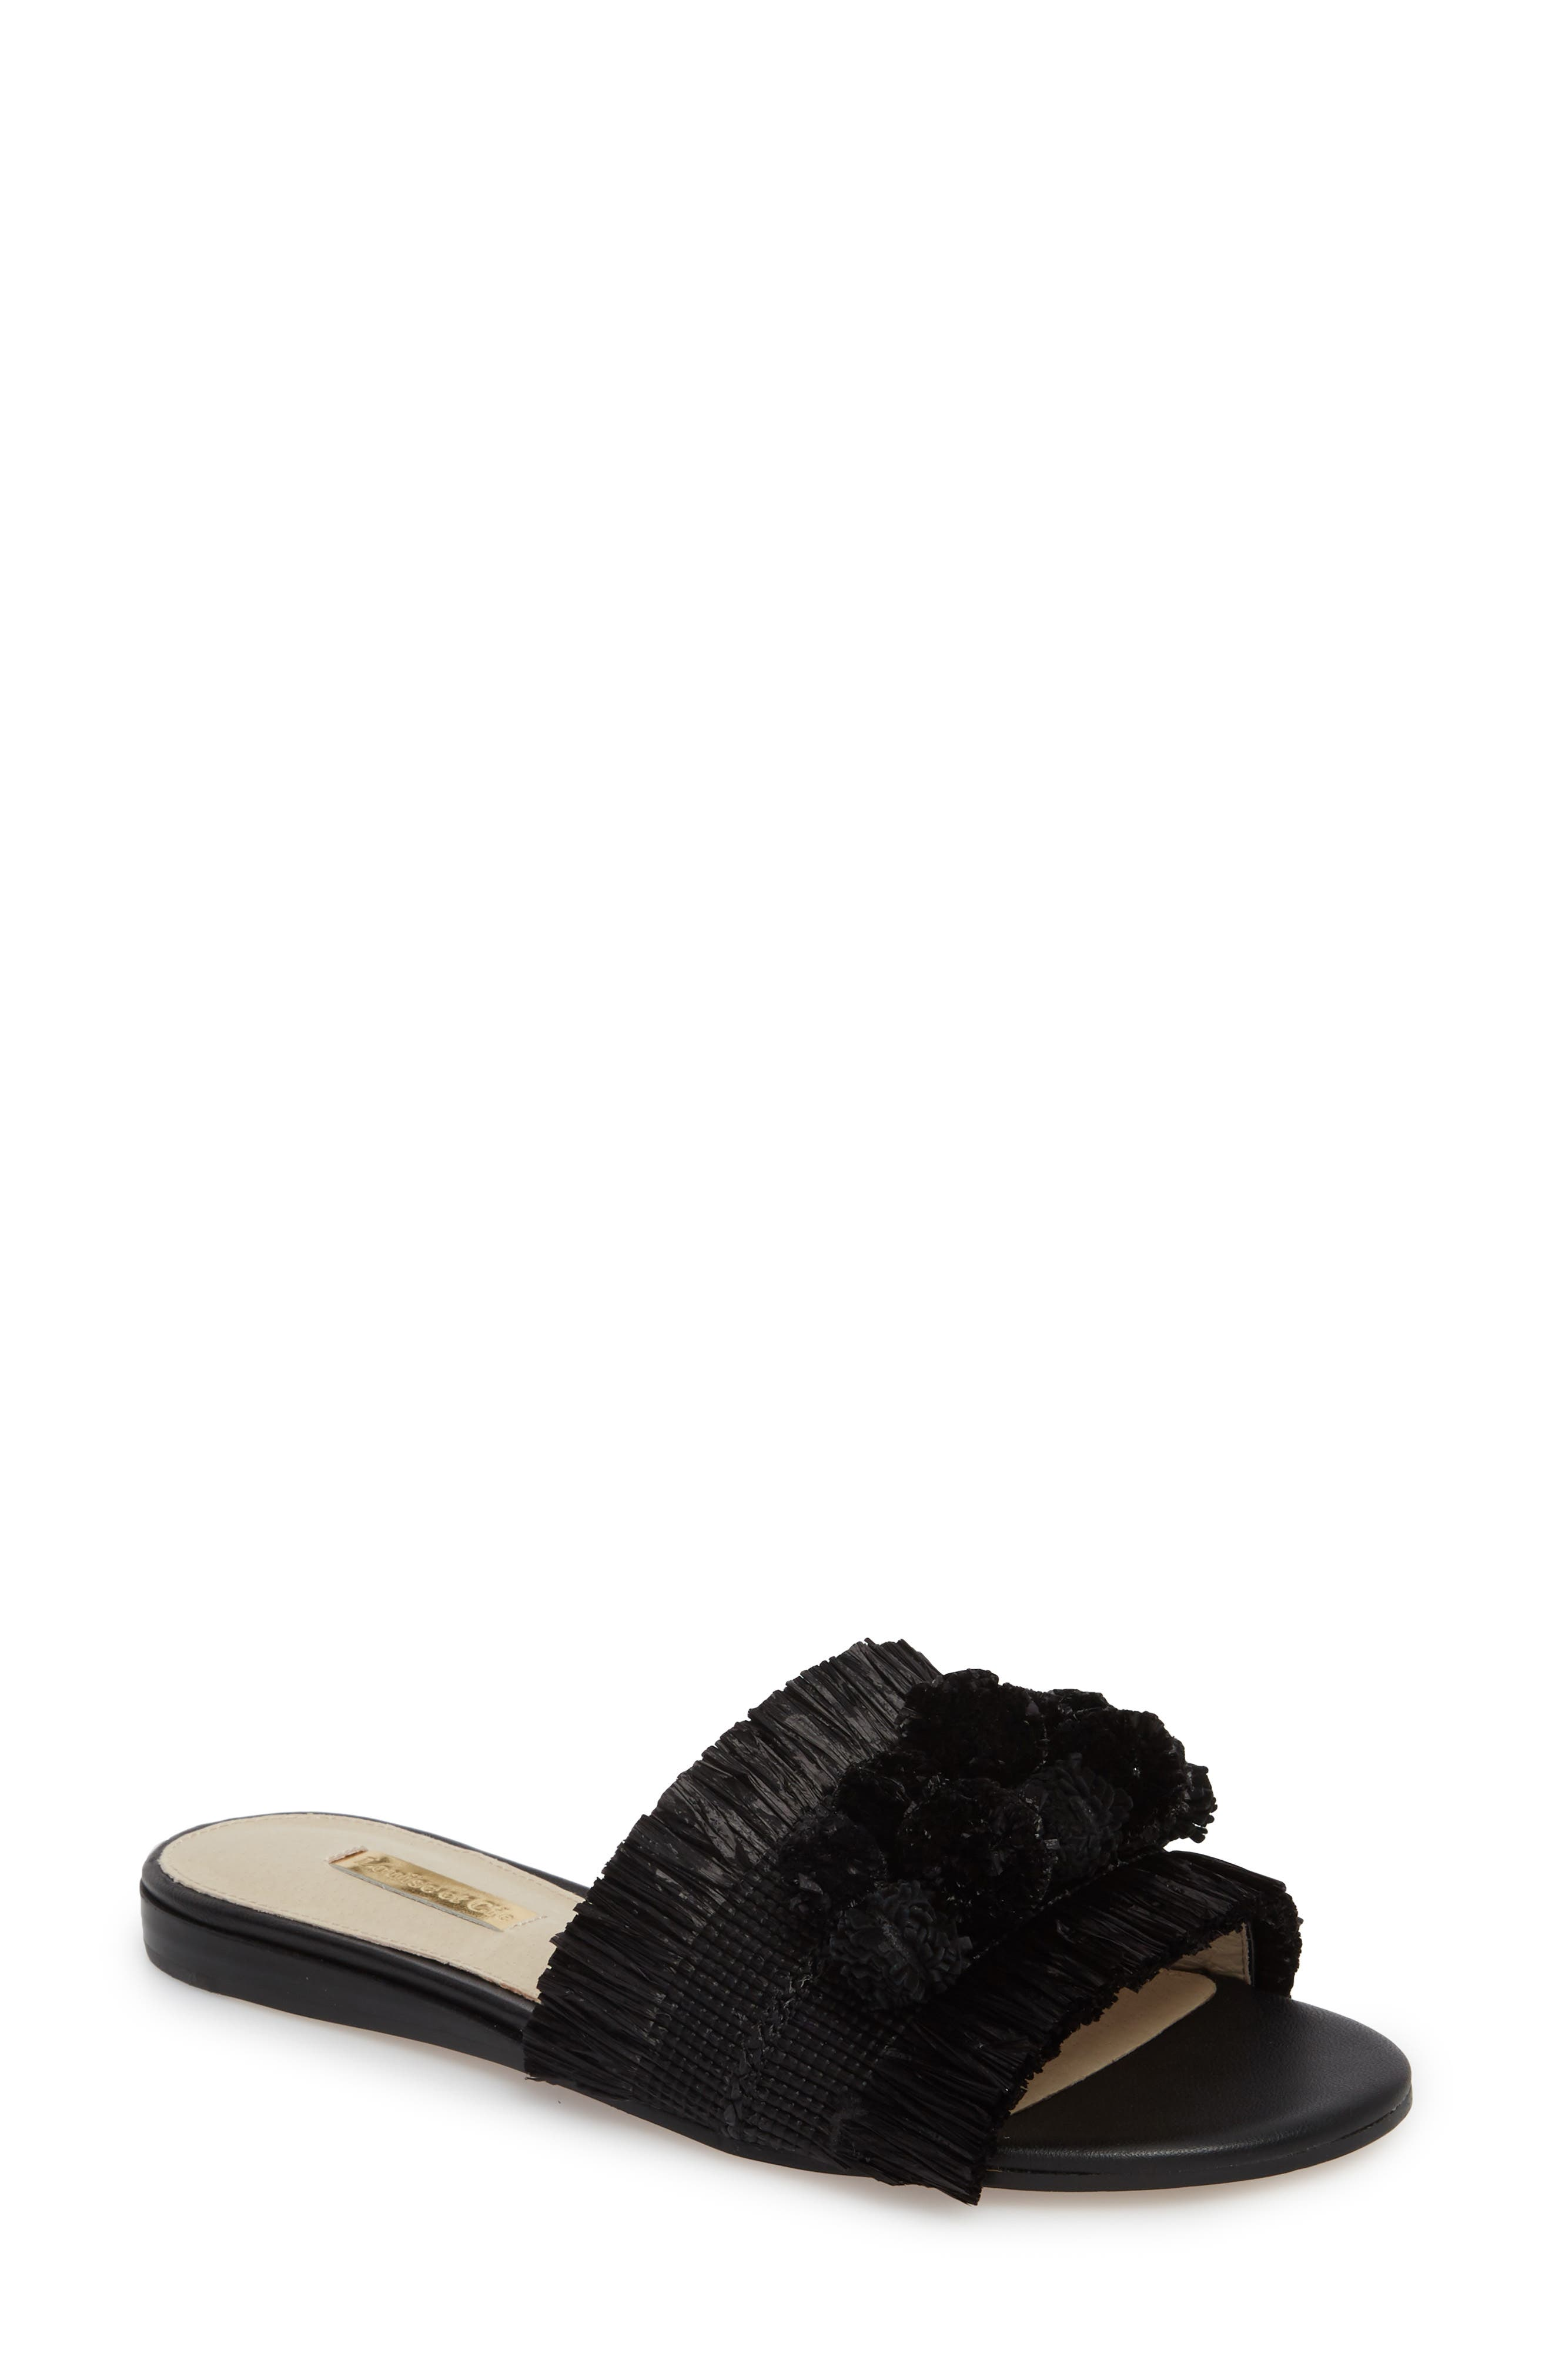 Arytha Raffia Slide Sandal,                         Main,                         color, 002